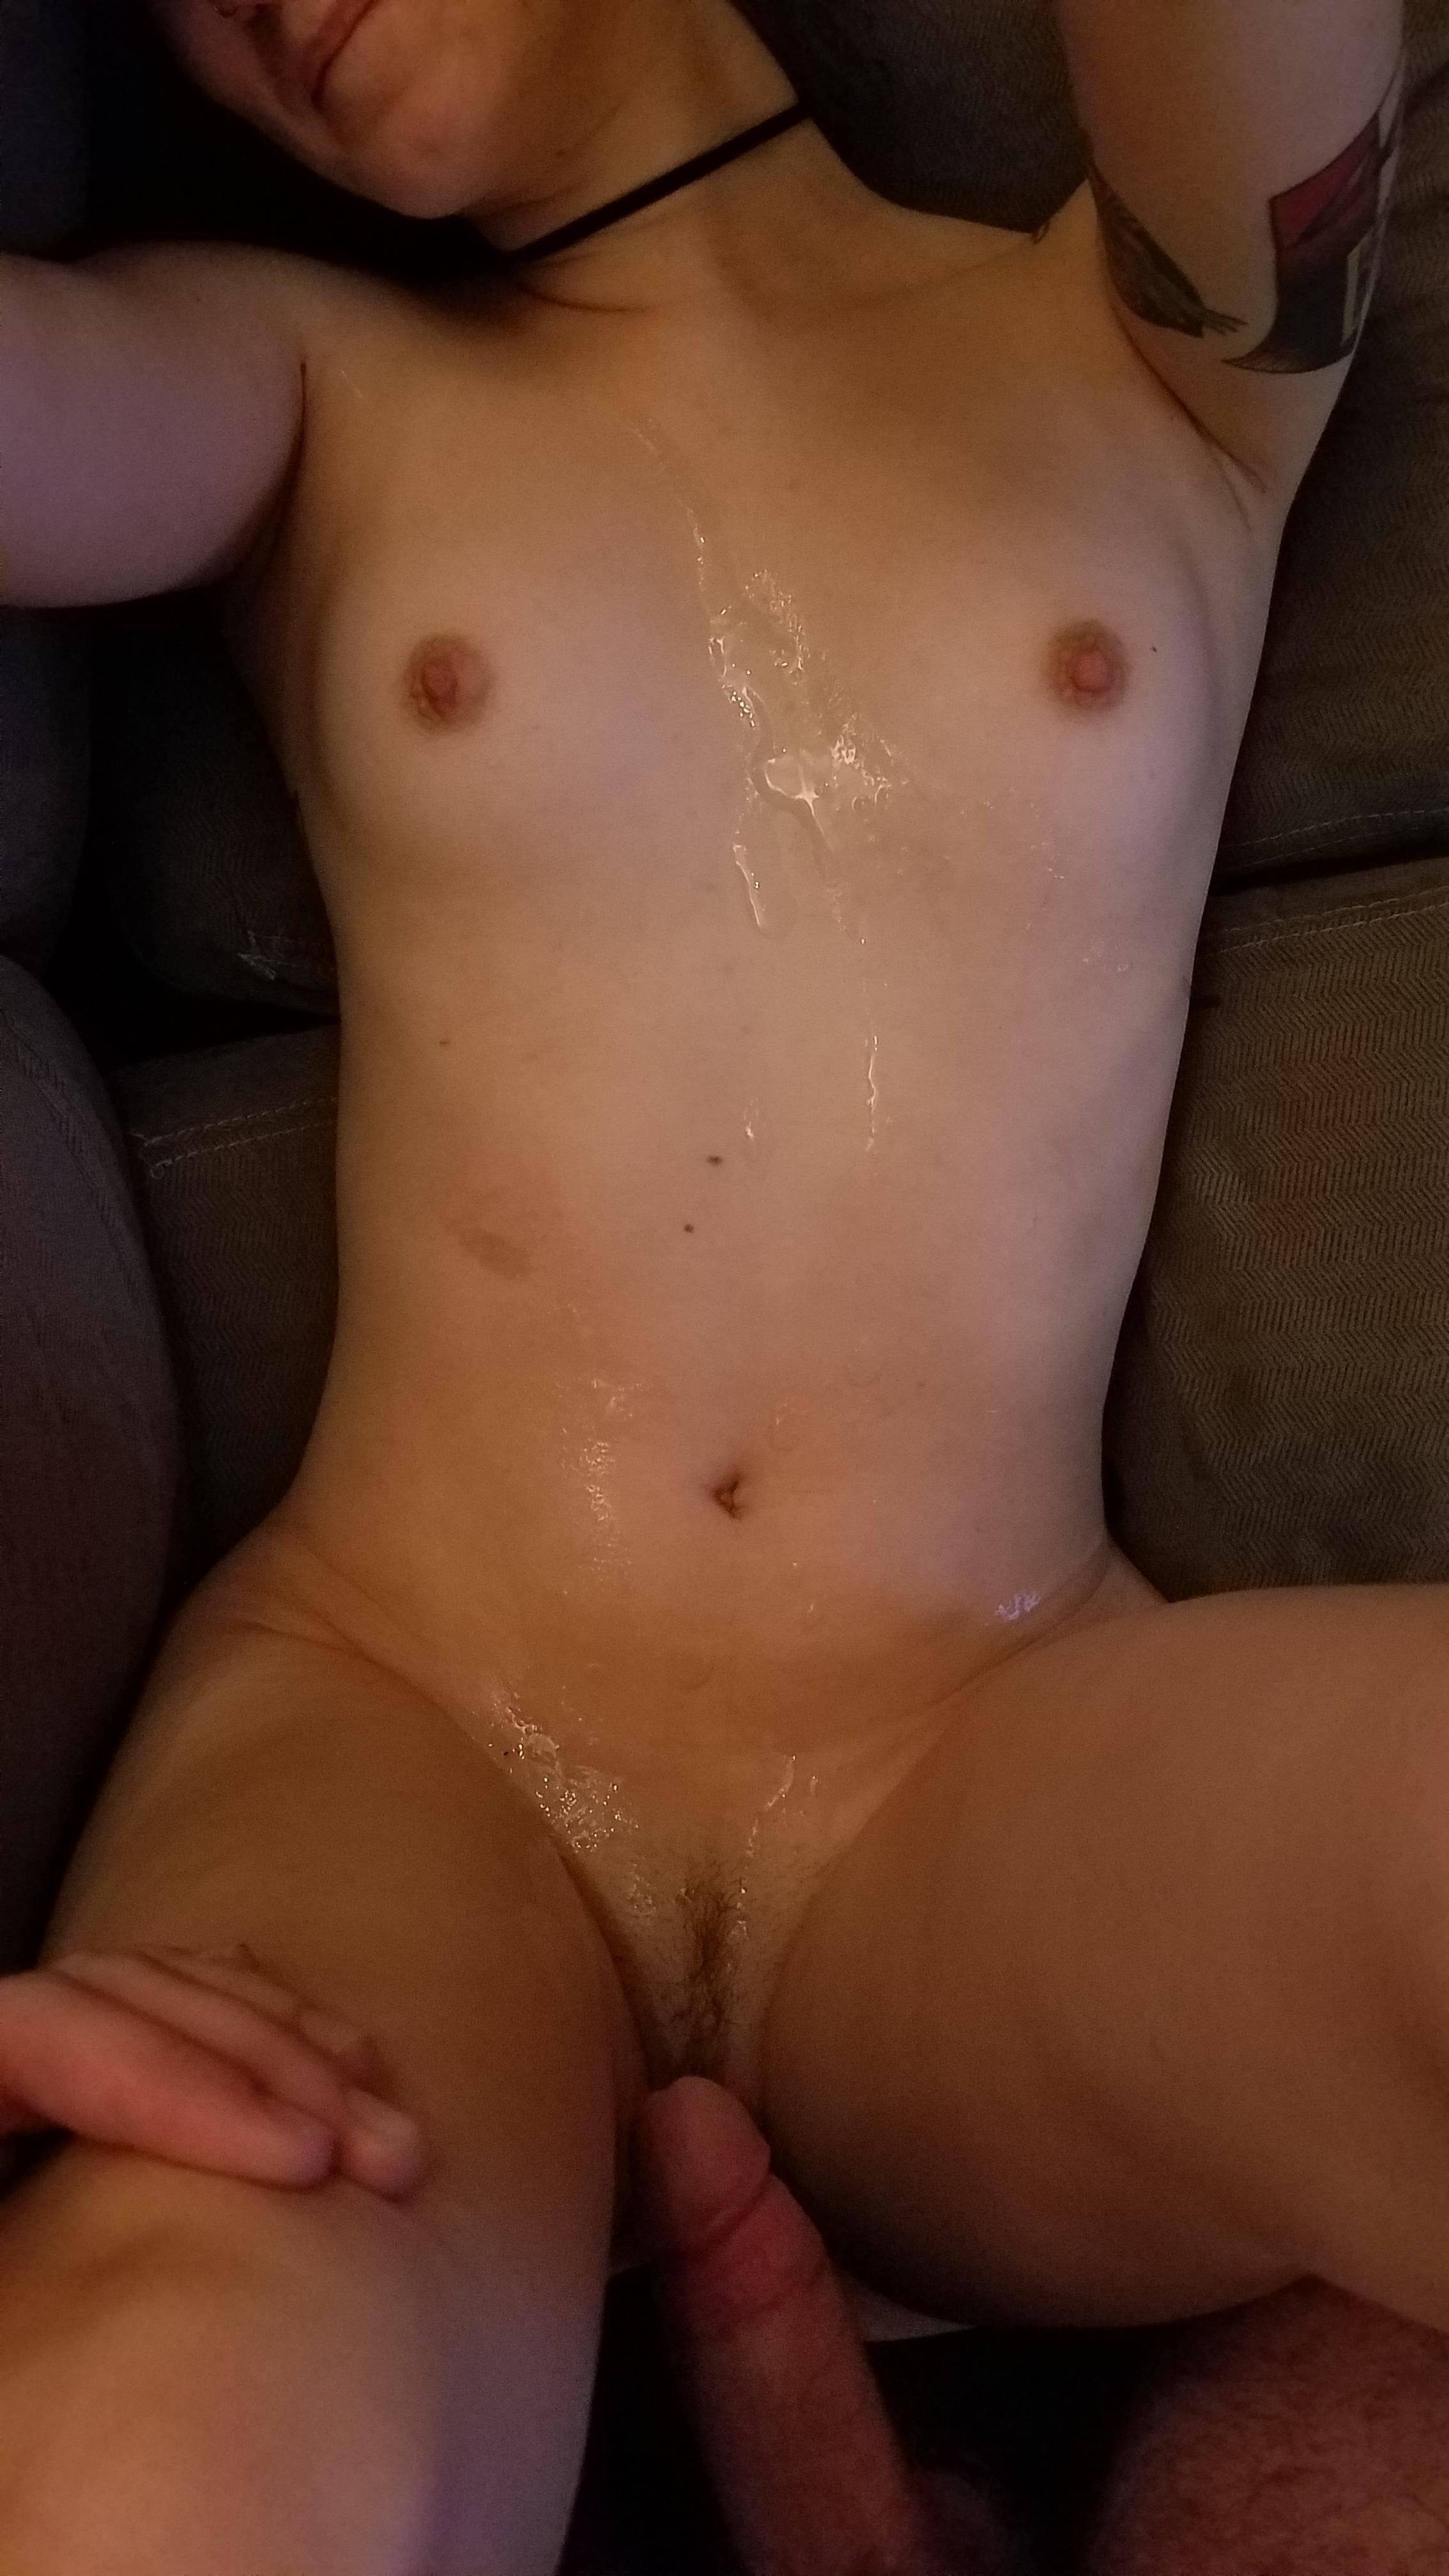 Best homemade amateur porn sites